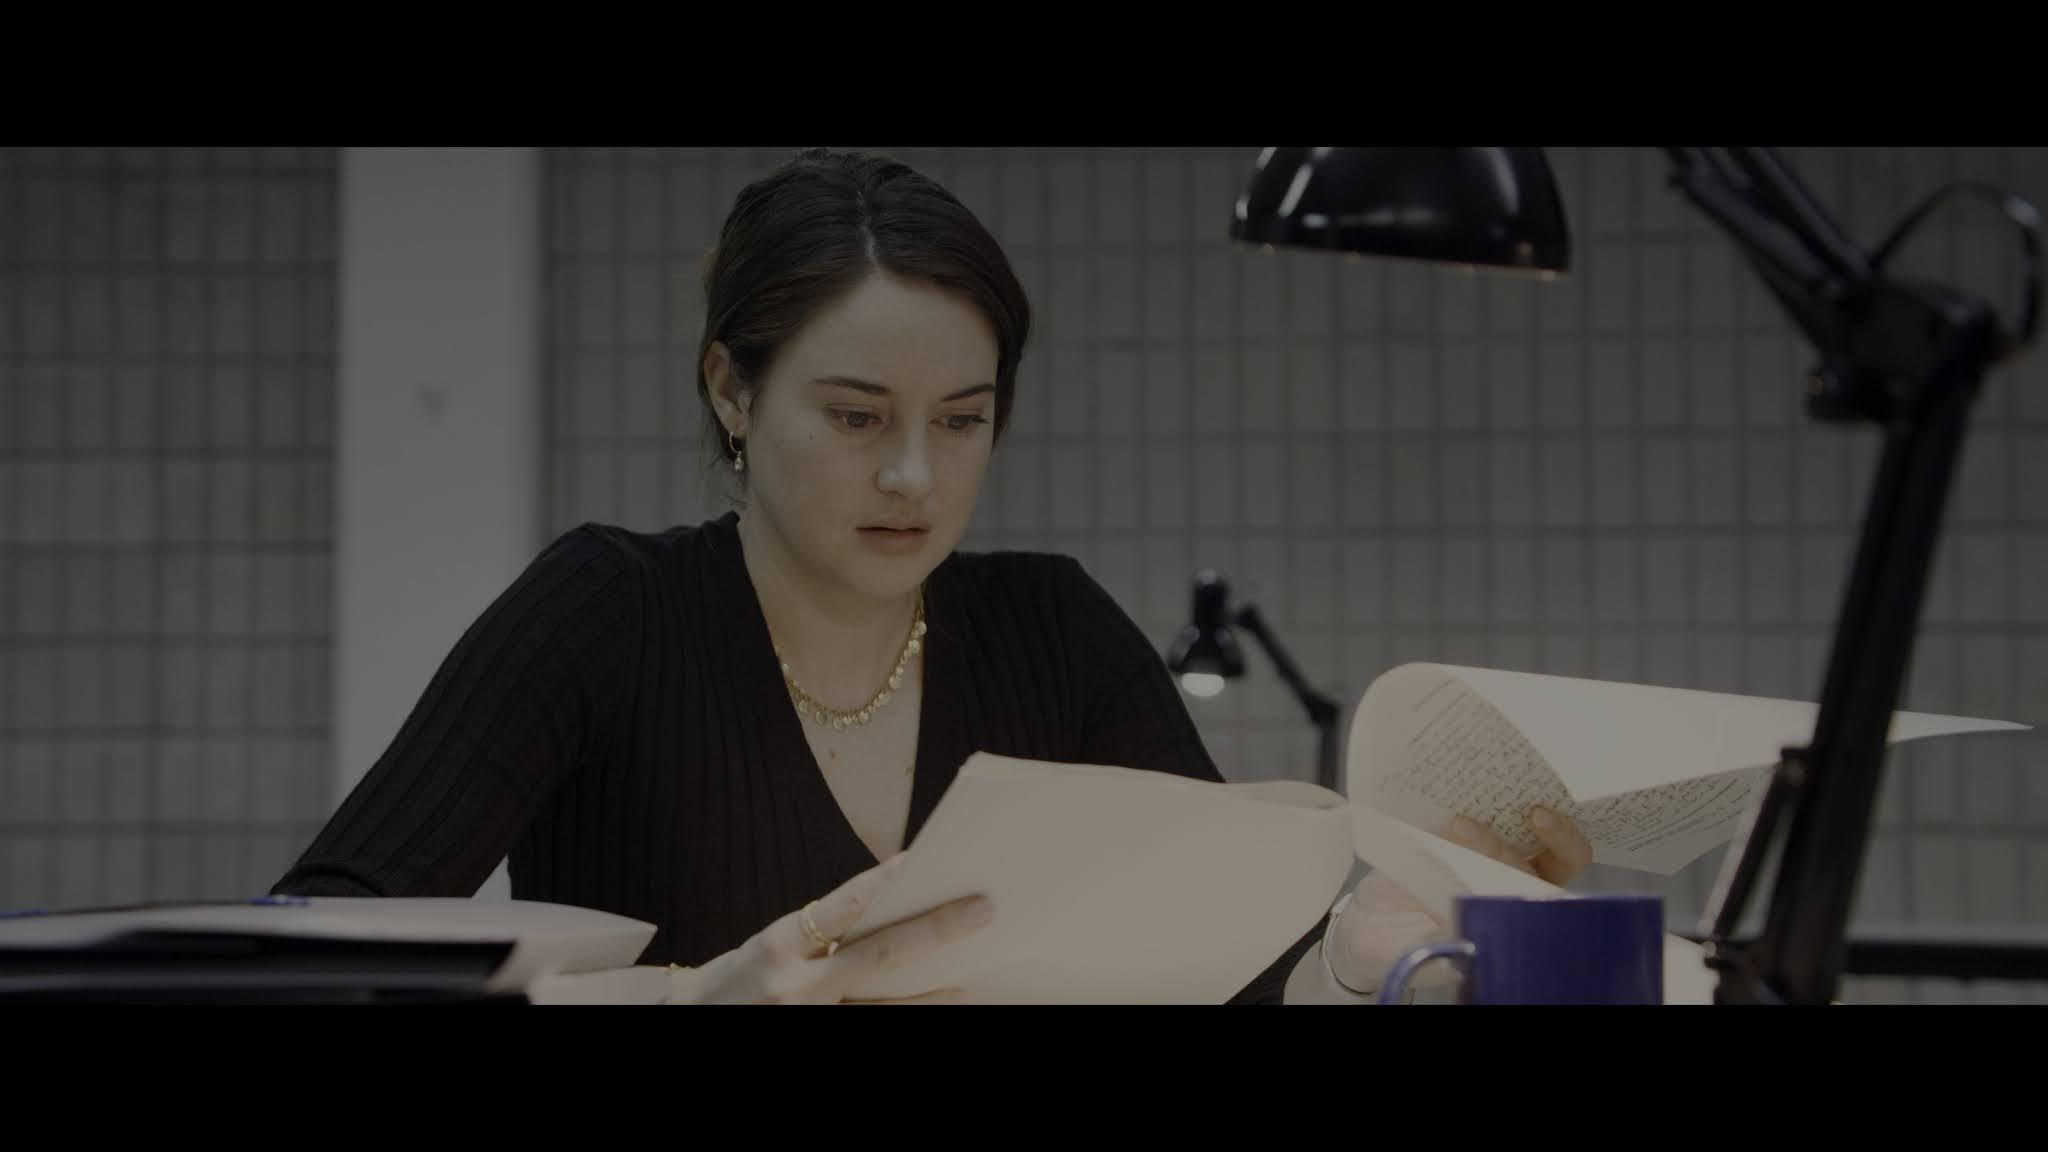 El Mauritano (2021) 4k WEB-DL HDR Latino